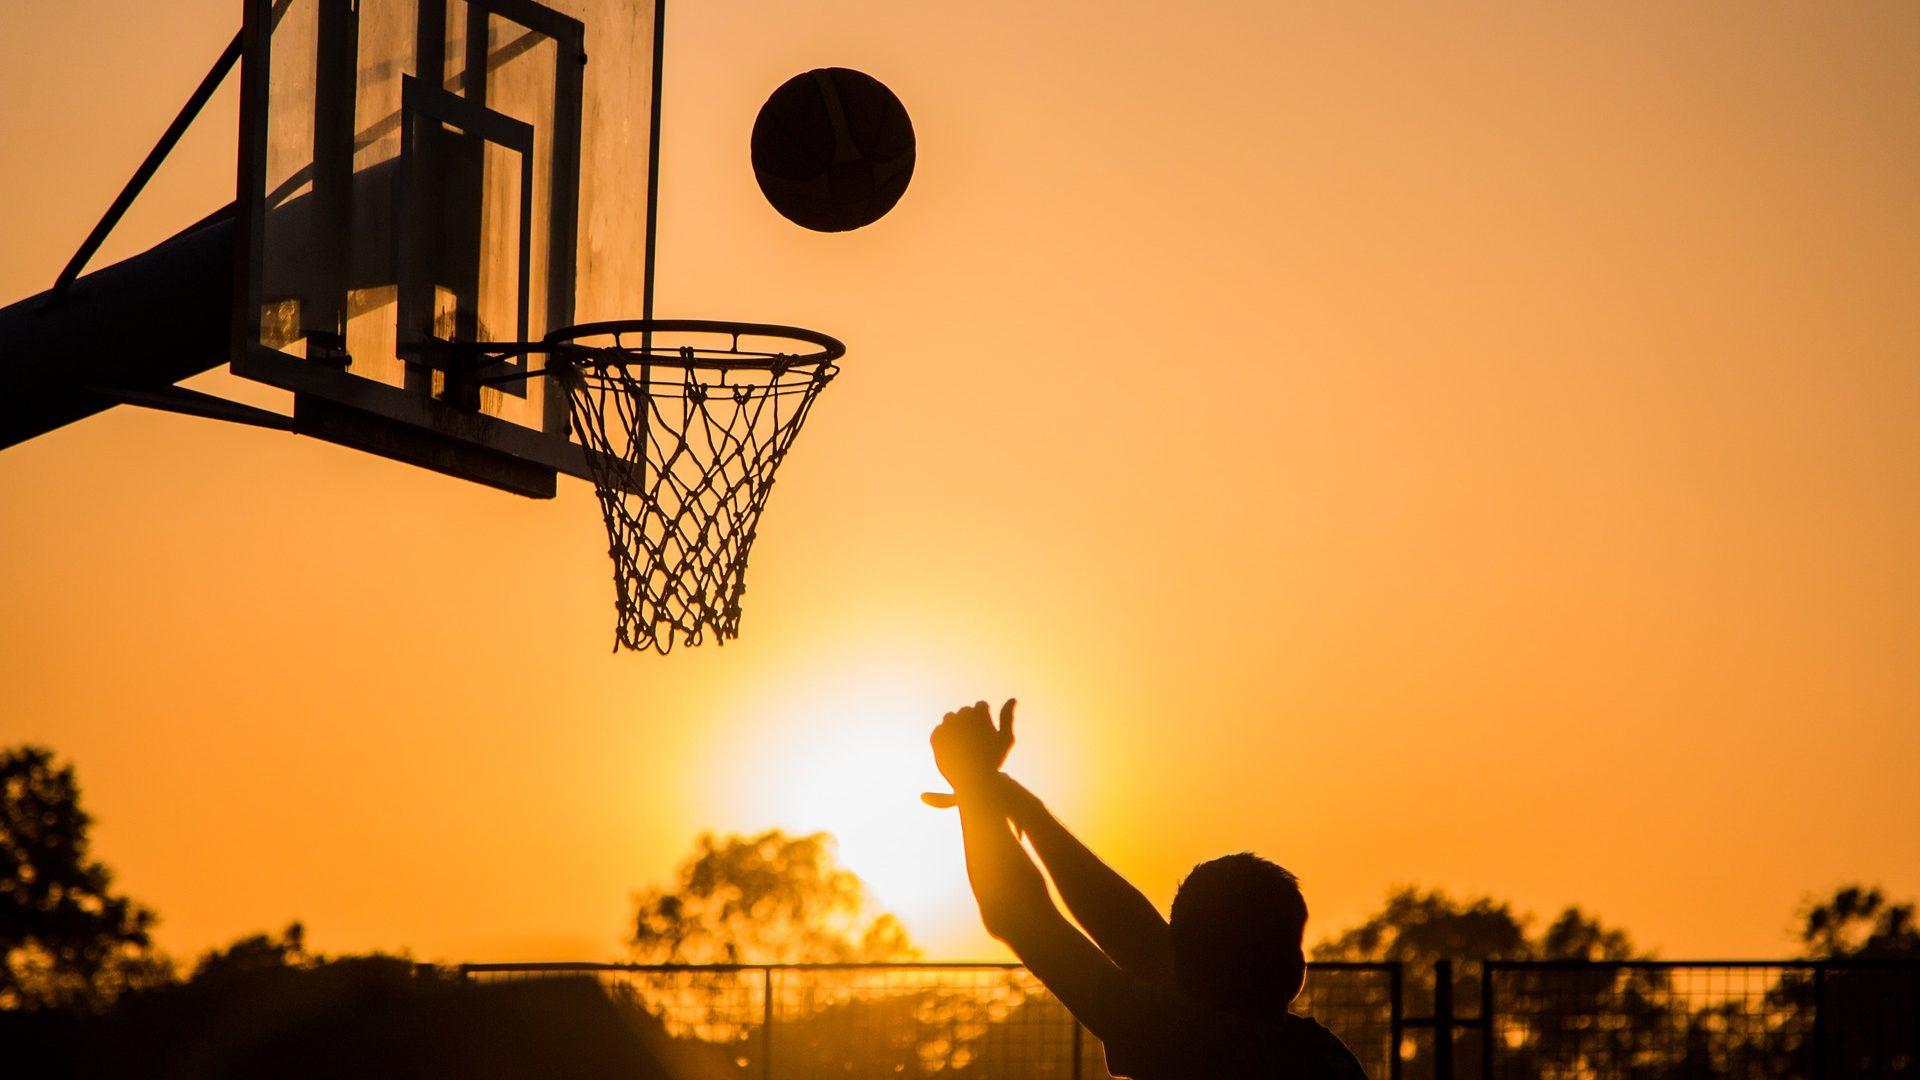 Image: Silhouette of a basketball player shooting